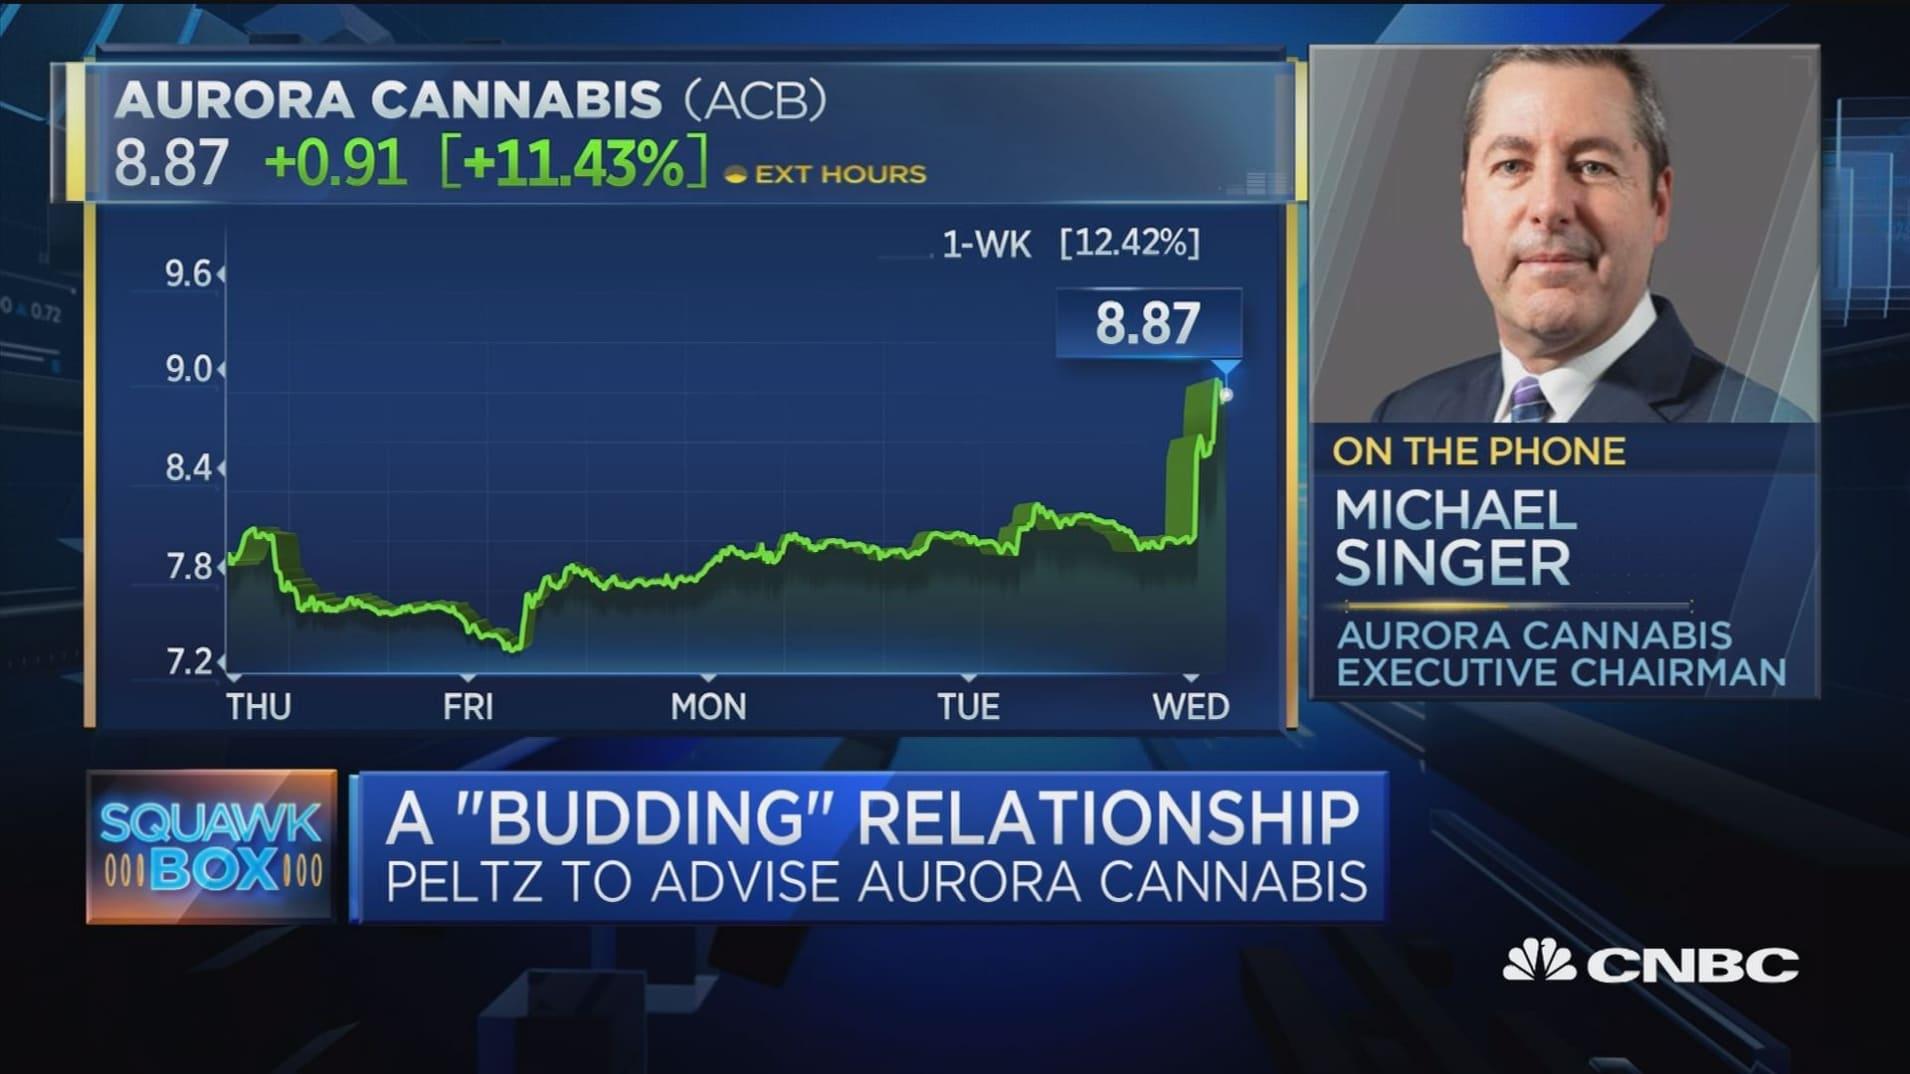 Aurora Cannabis chairman describes Nelson Peltz partnership, plans for consumer expansion